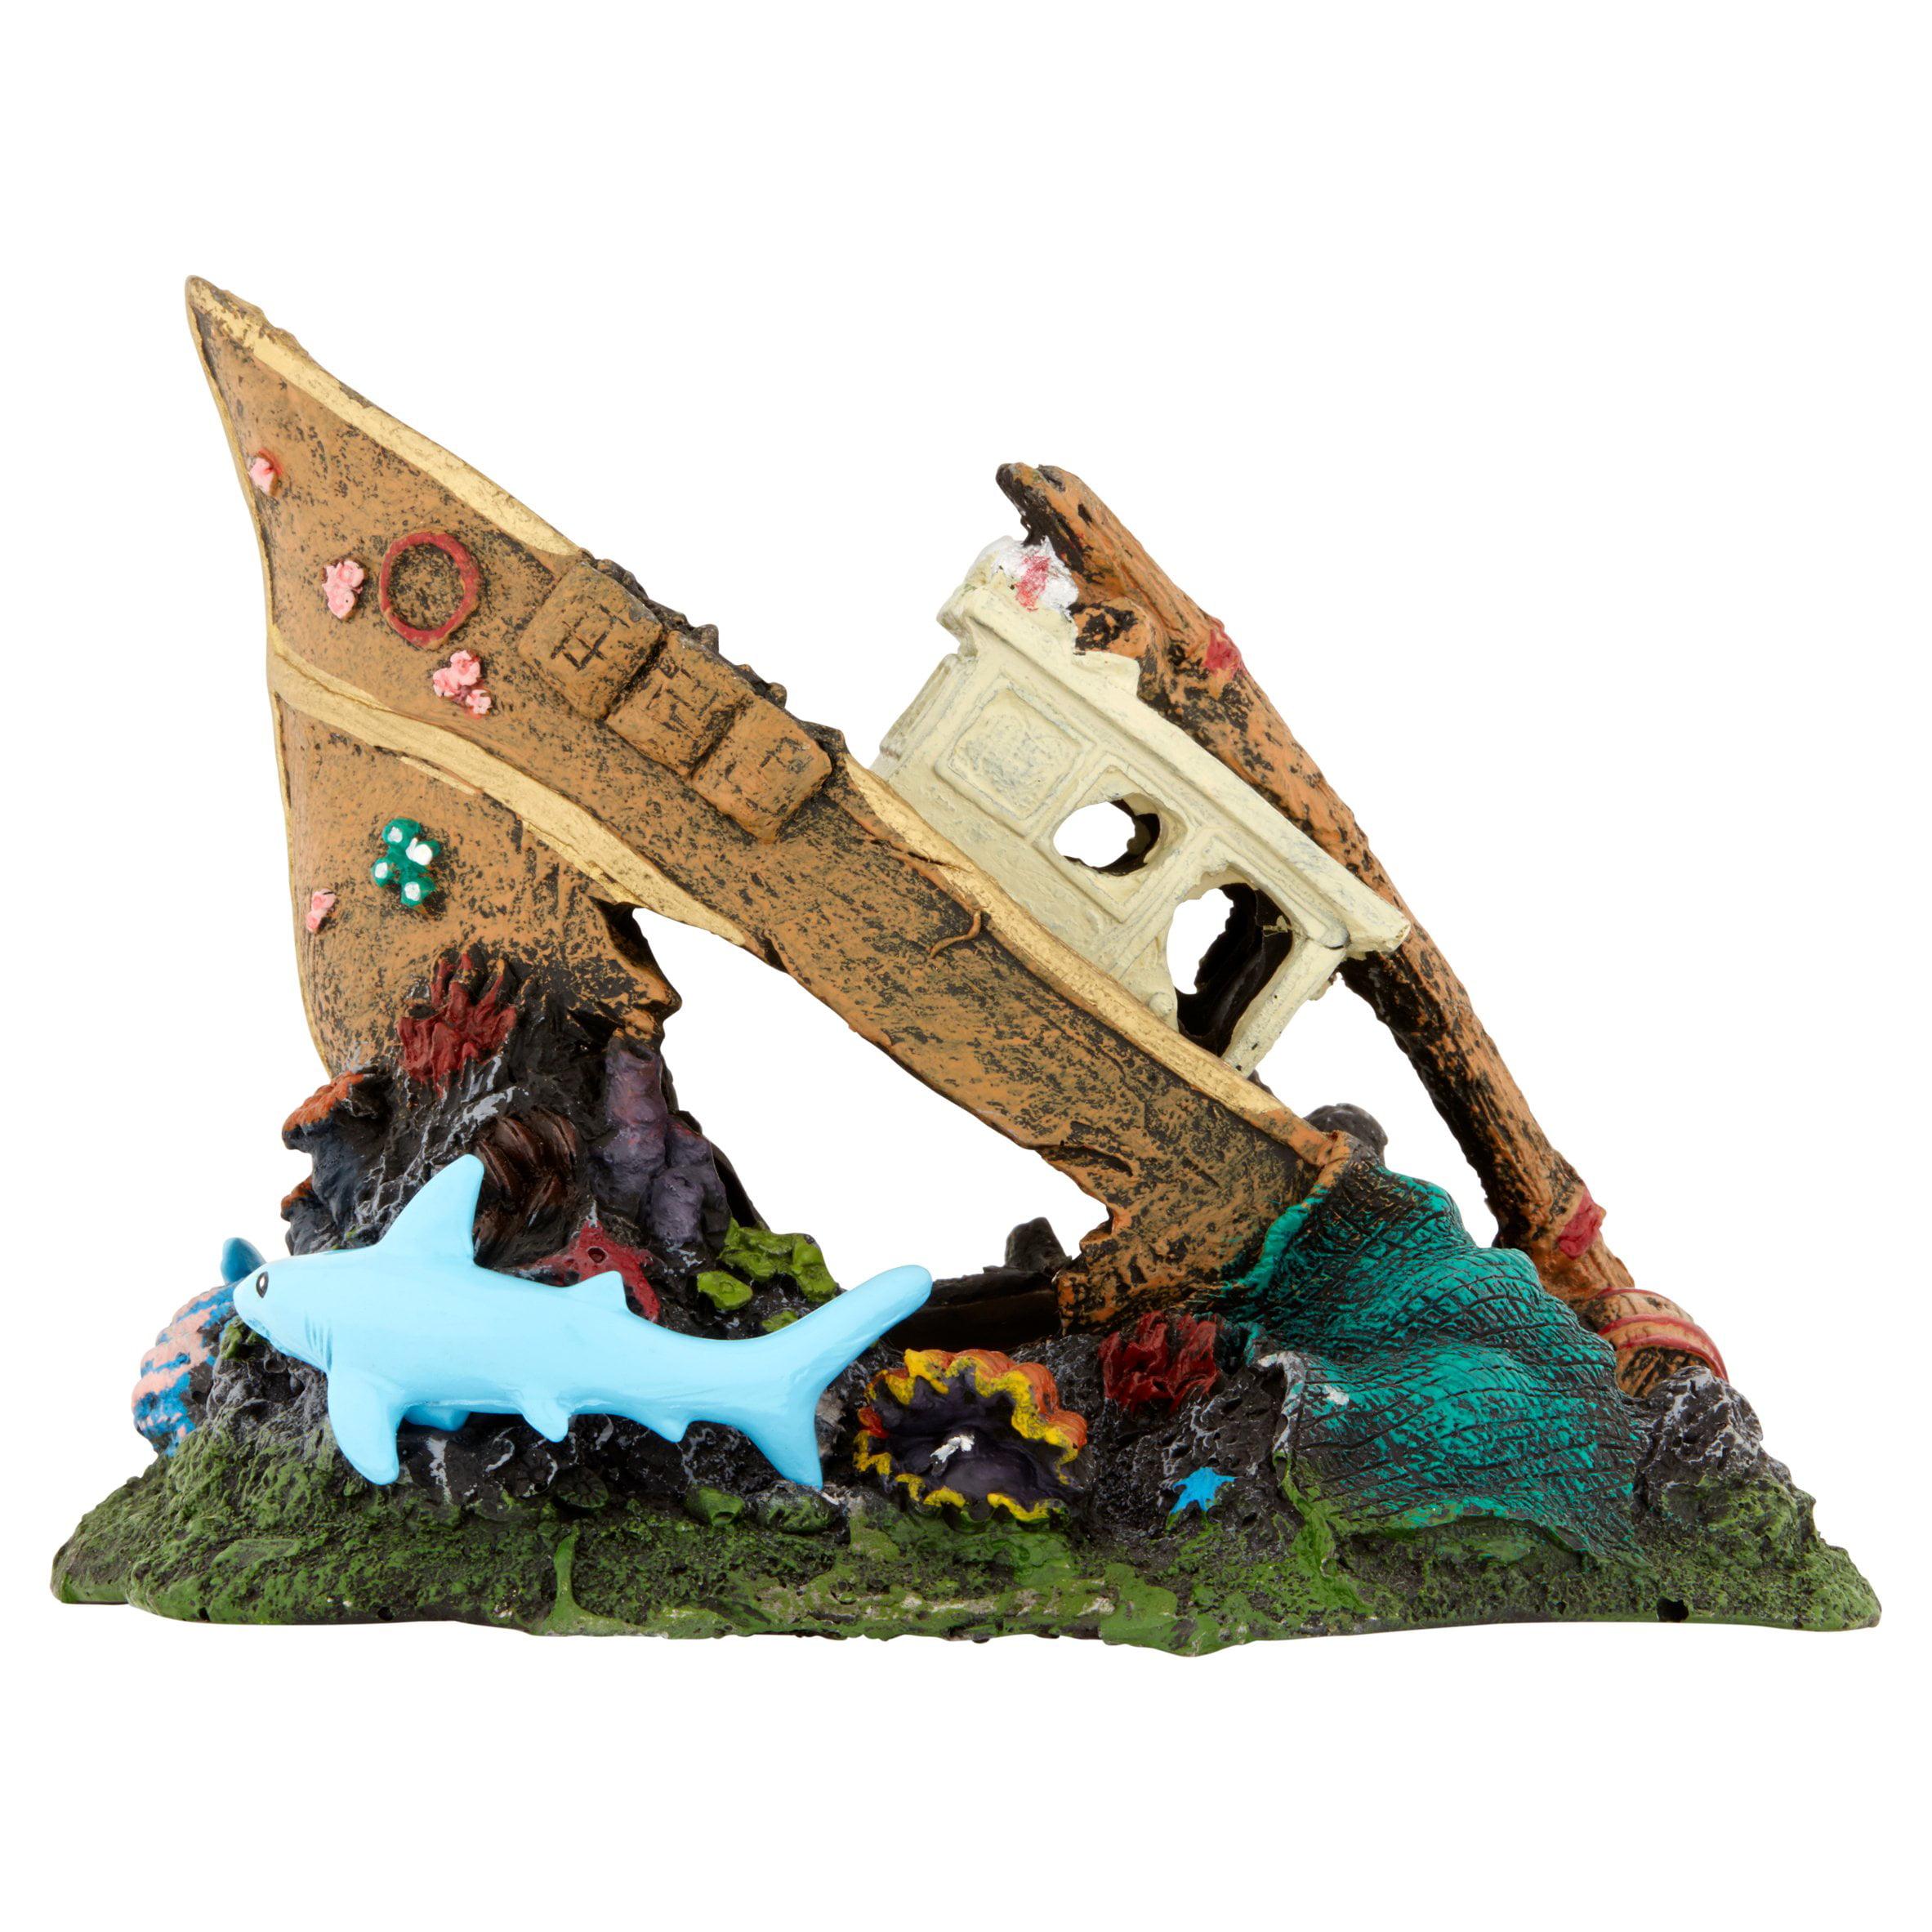 Aqua Culture Large Ship or Coral Reef Aquarium Ornament, Assorted Item May Vary by Wal-Mart Stores, Inc.